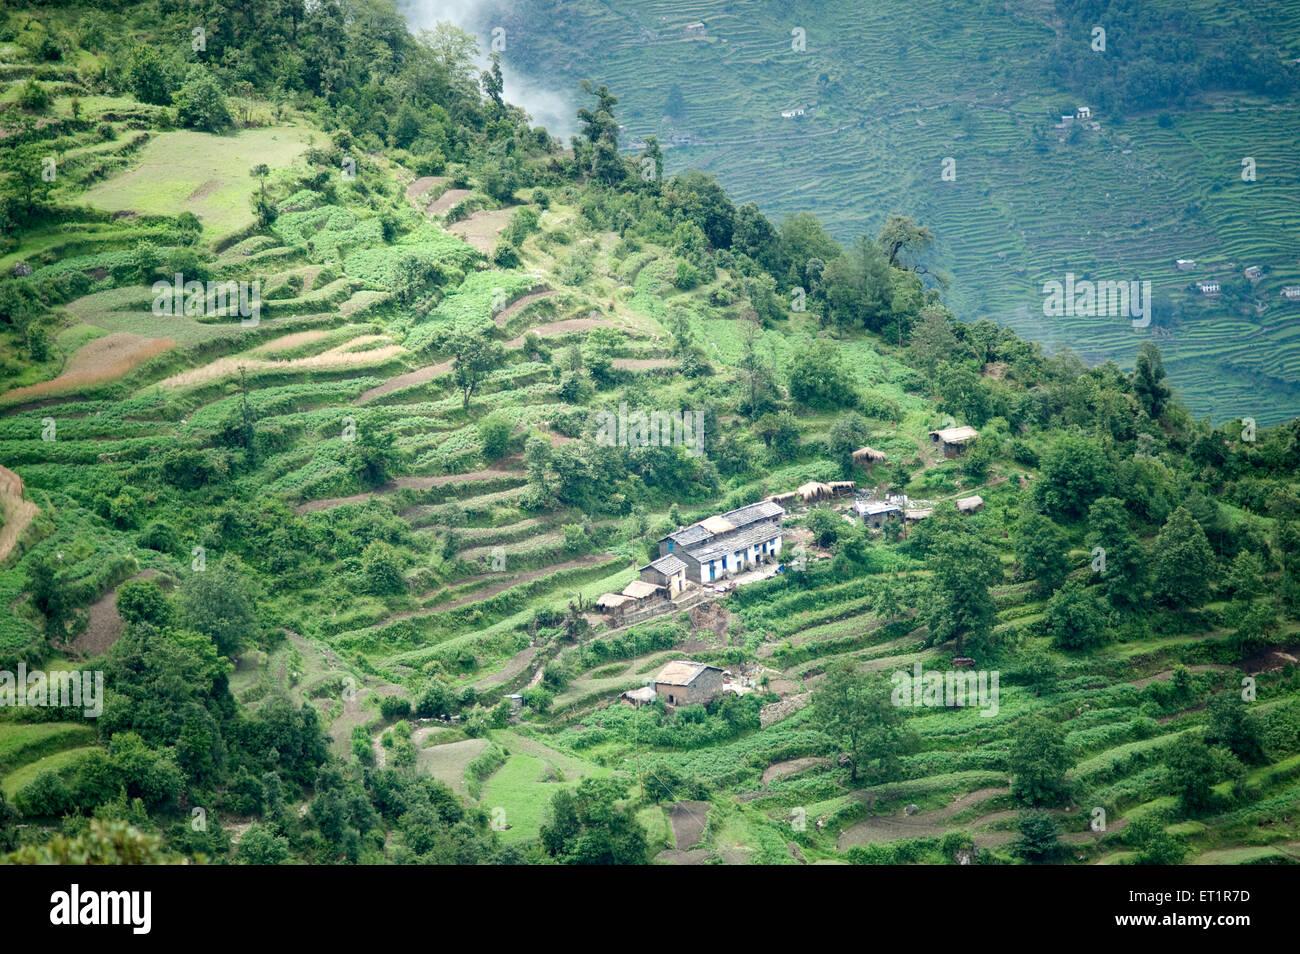 Petit village et terrasse l'agriculture en himalaya d'Uttarakhand en Inde Asie Photo Stock